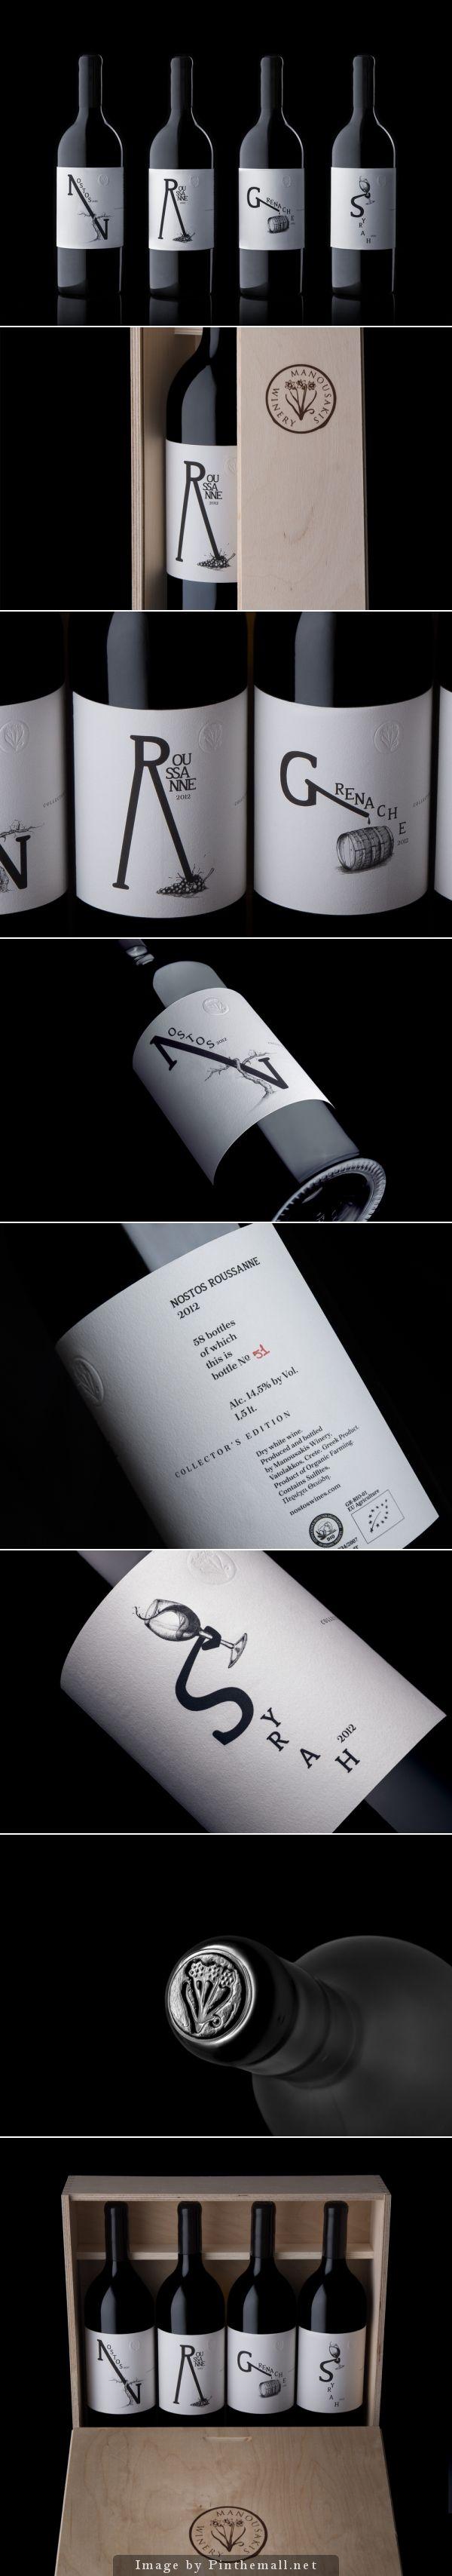 #design #packaging #label #wine